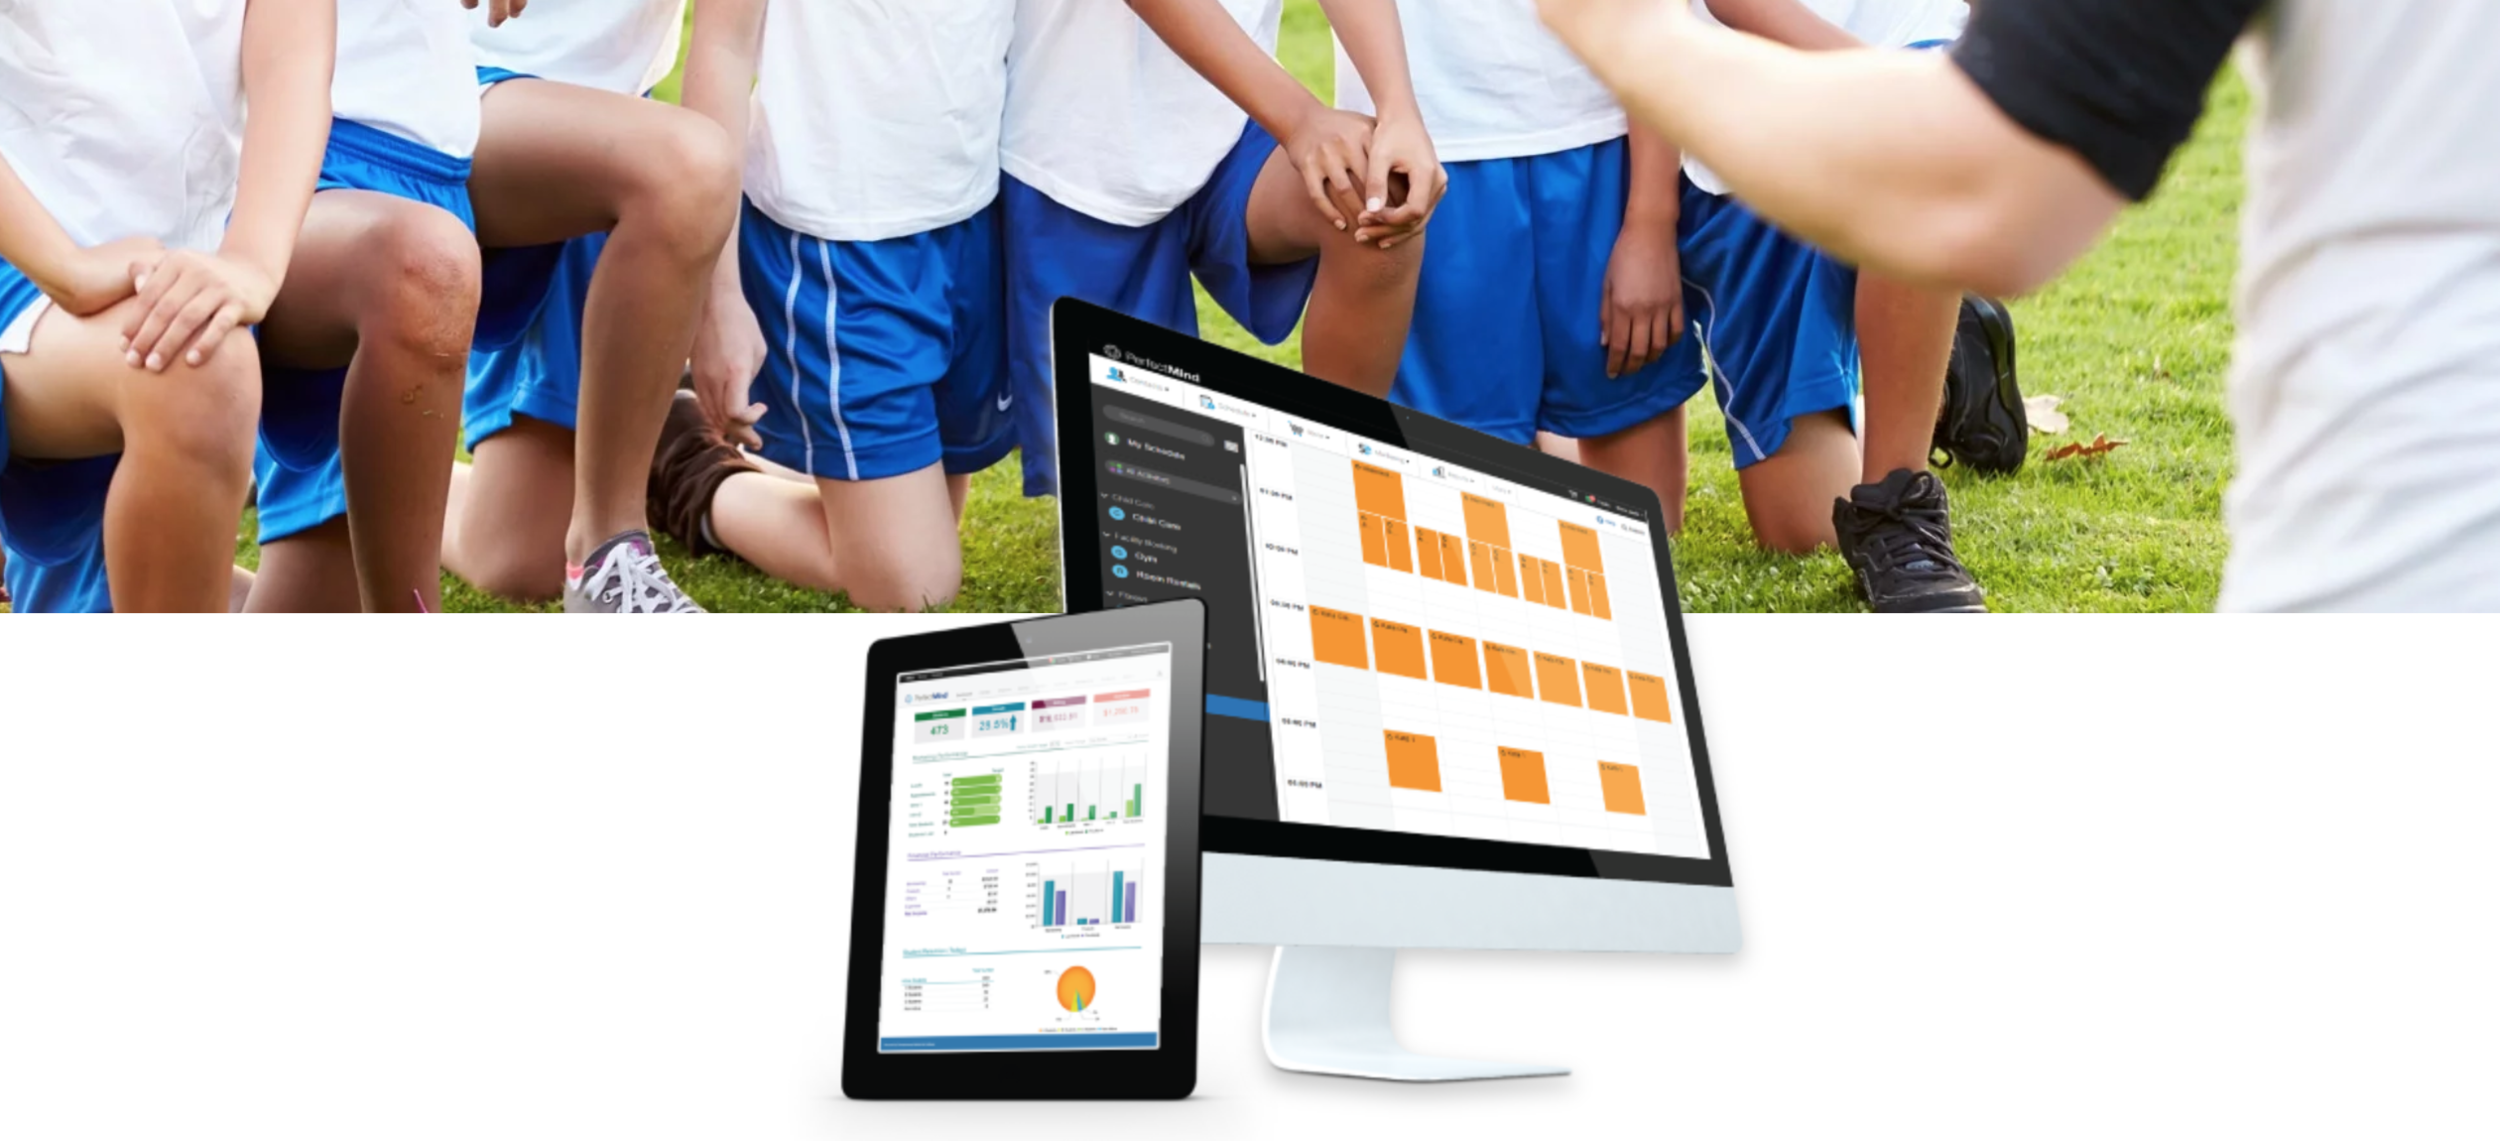 PerfectMind - Communications, Content Creation, Marketing,Media and PR, UX/ UI Design